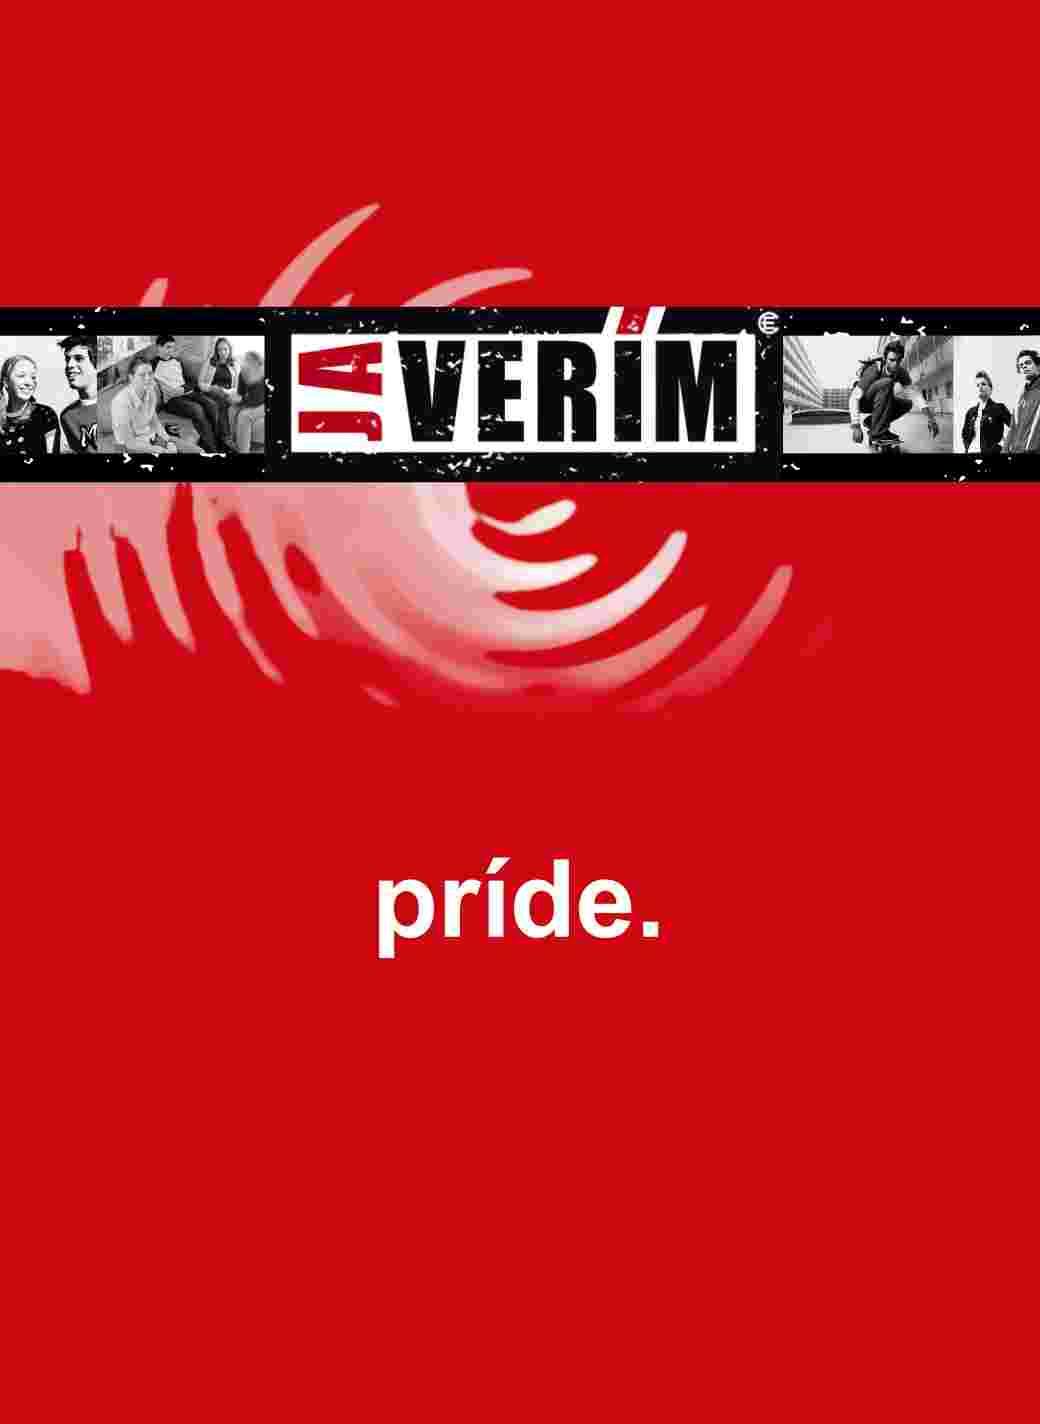 Ja Verim